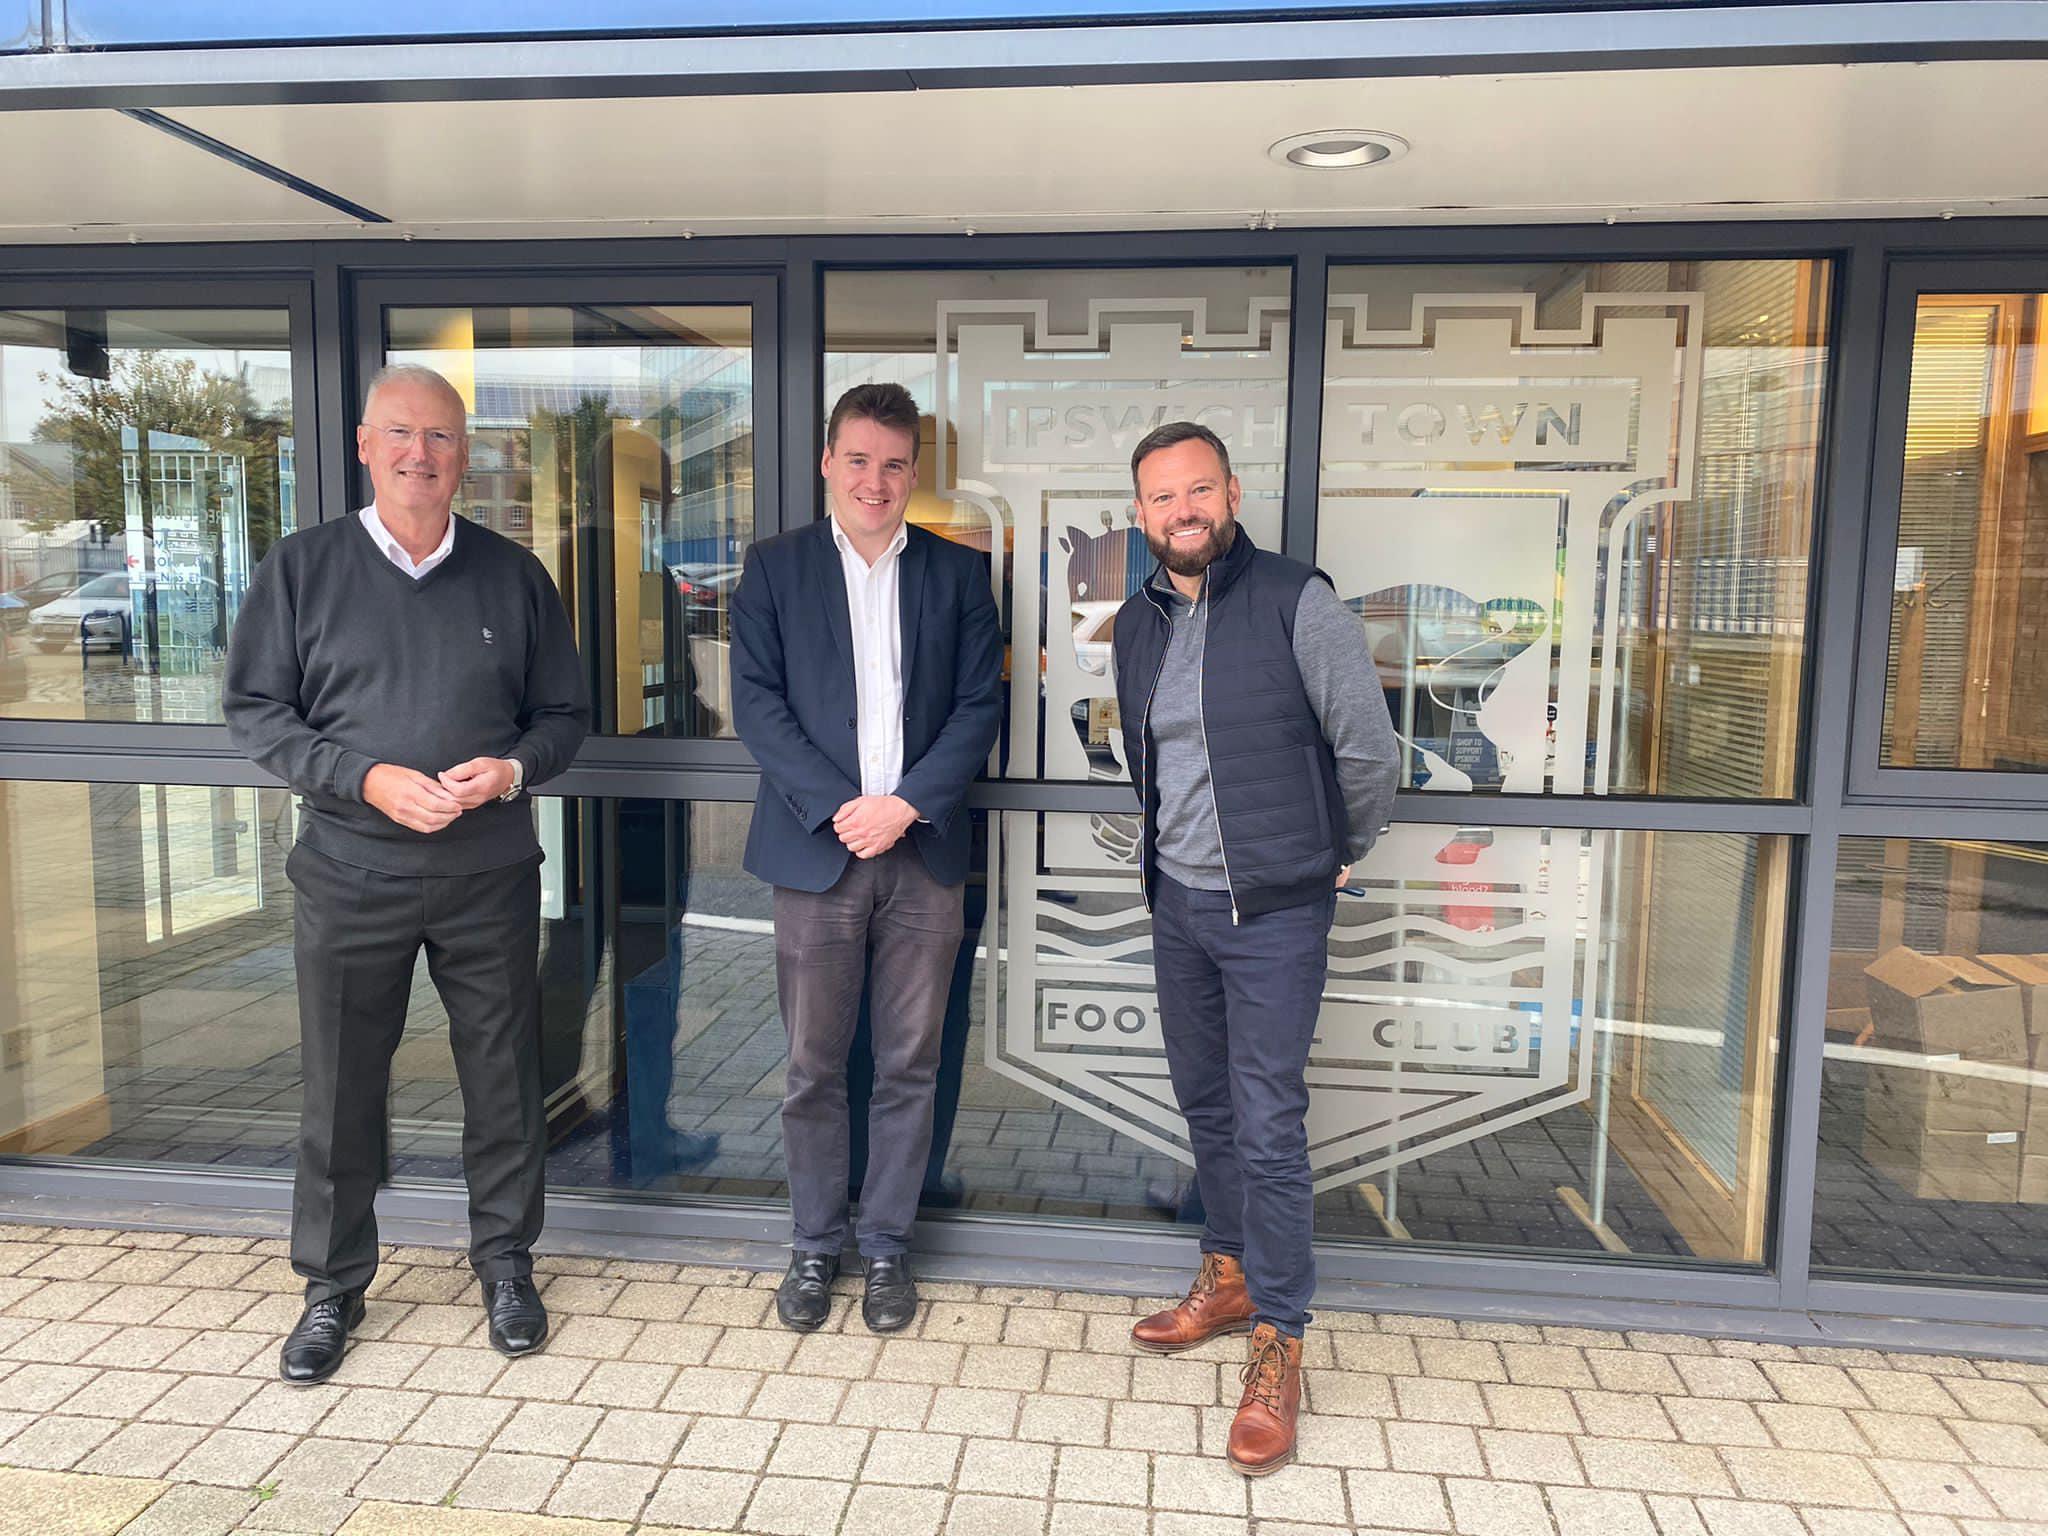 Meeting the new leadership team at Portman Road